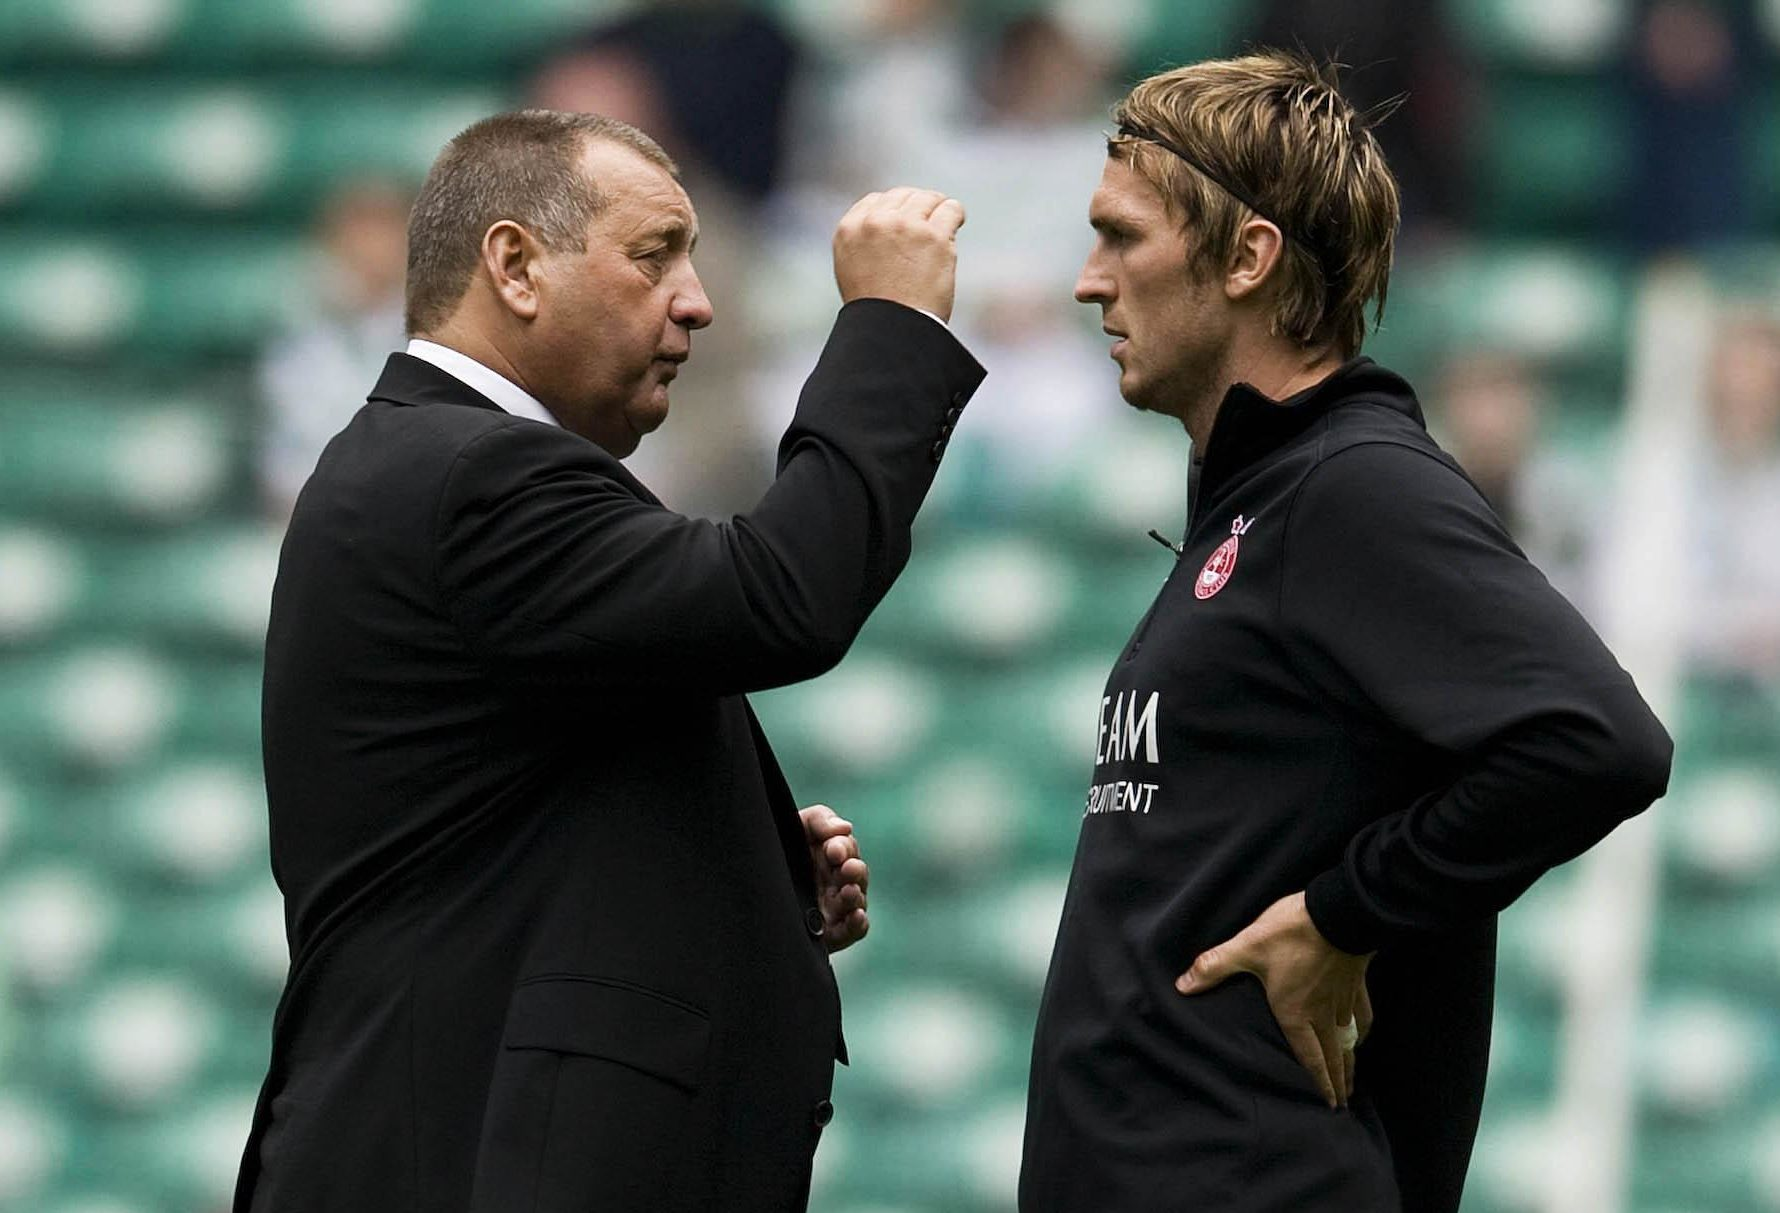 Lee Miller with then-Aberdeen boss Jimmy Calderwood.